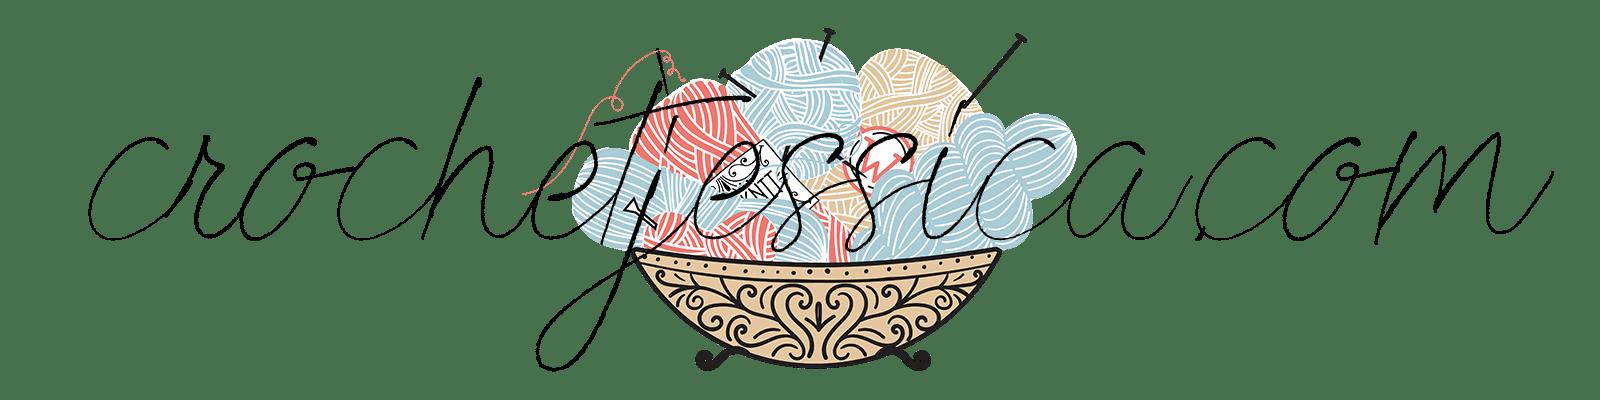 Crochet clipart knitting basket. Crochetjessica com and knit